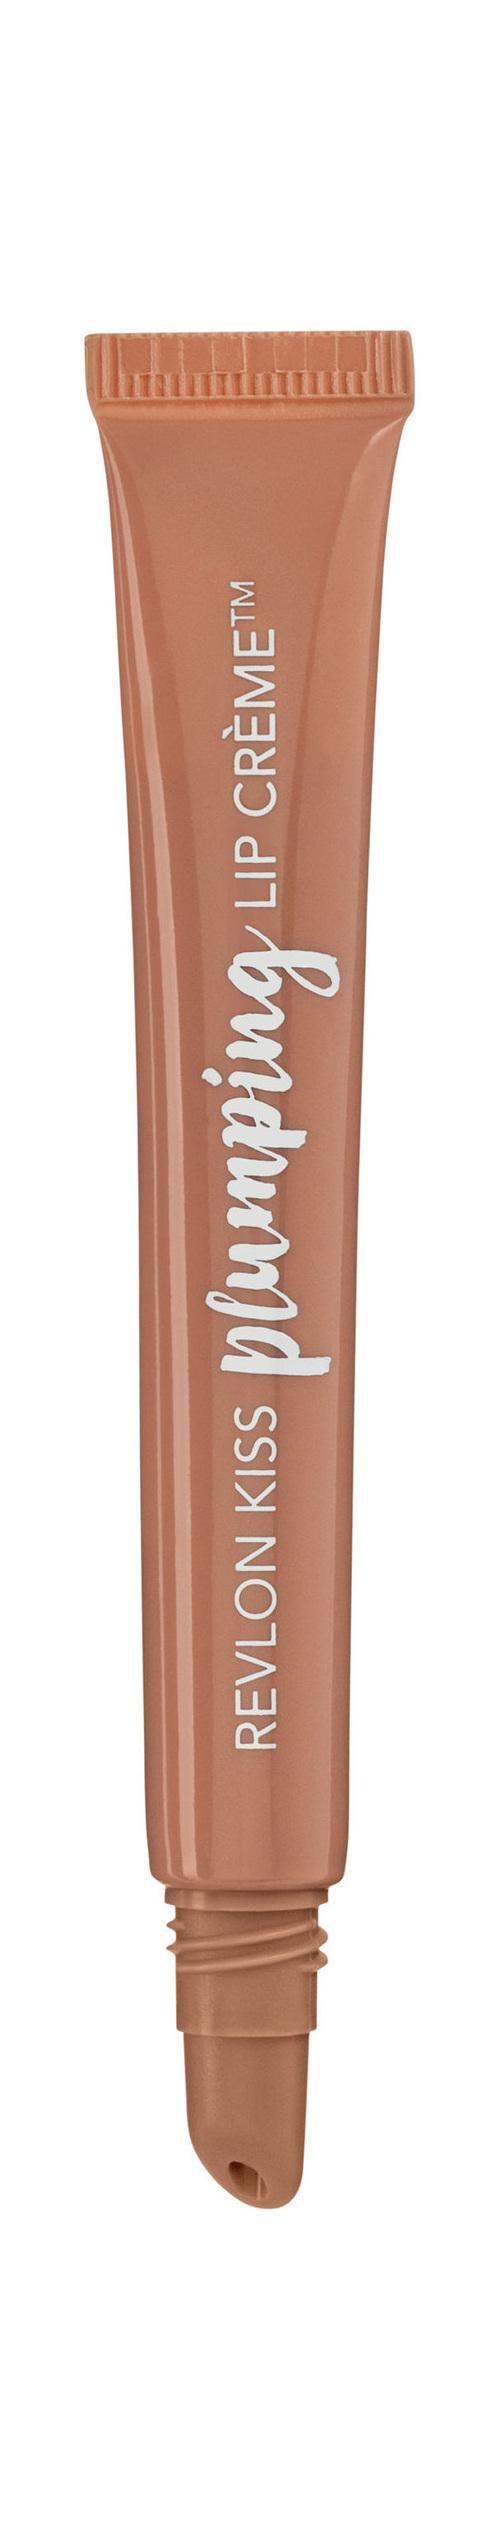 Revlon Kiss Plumping Lip Creme 500 Cashmere Creme